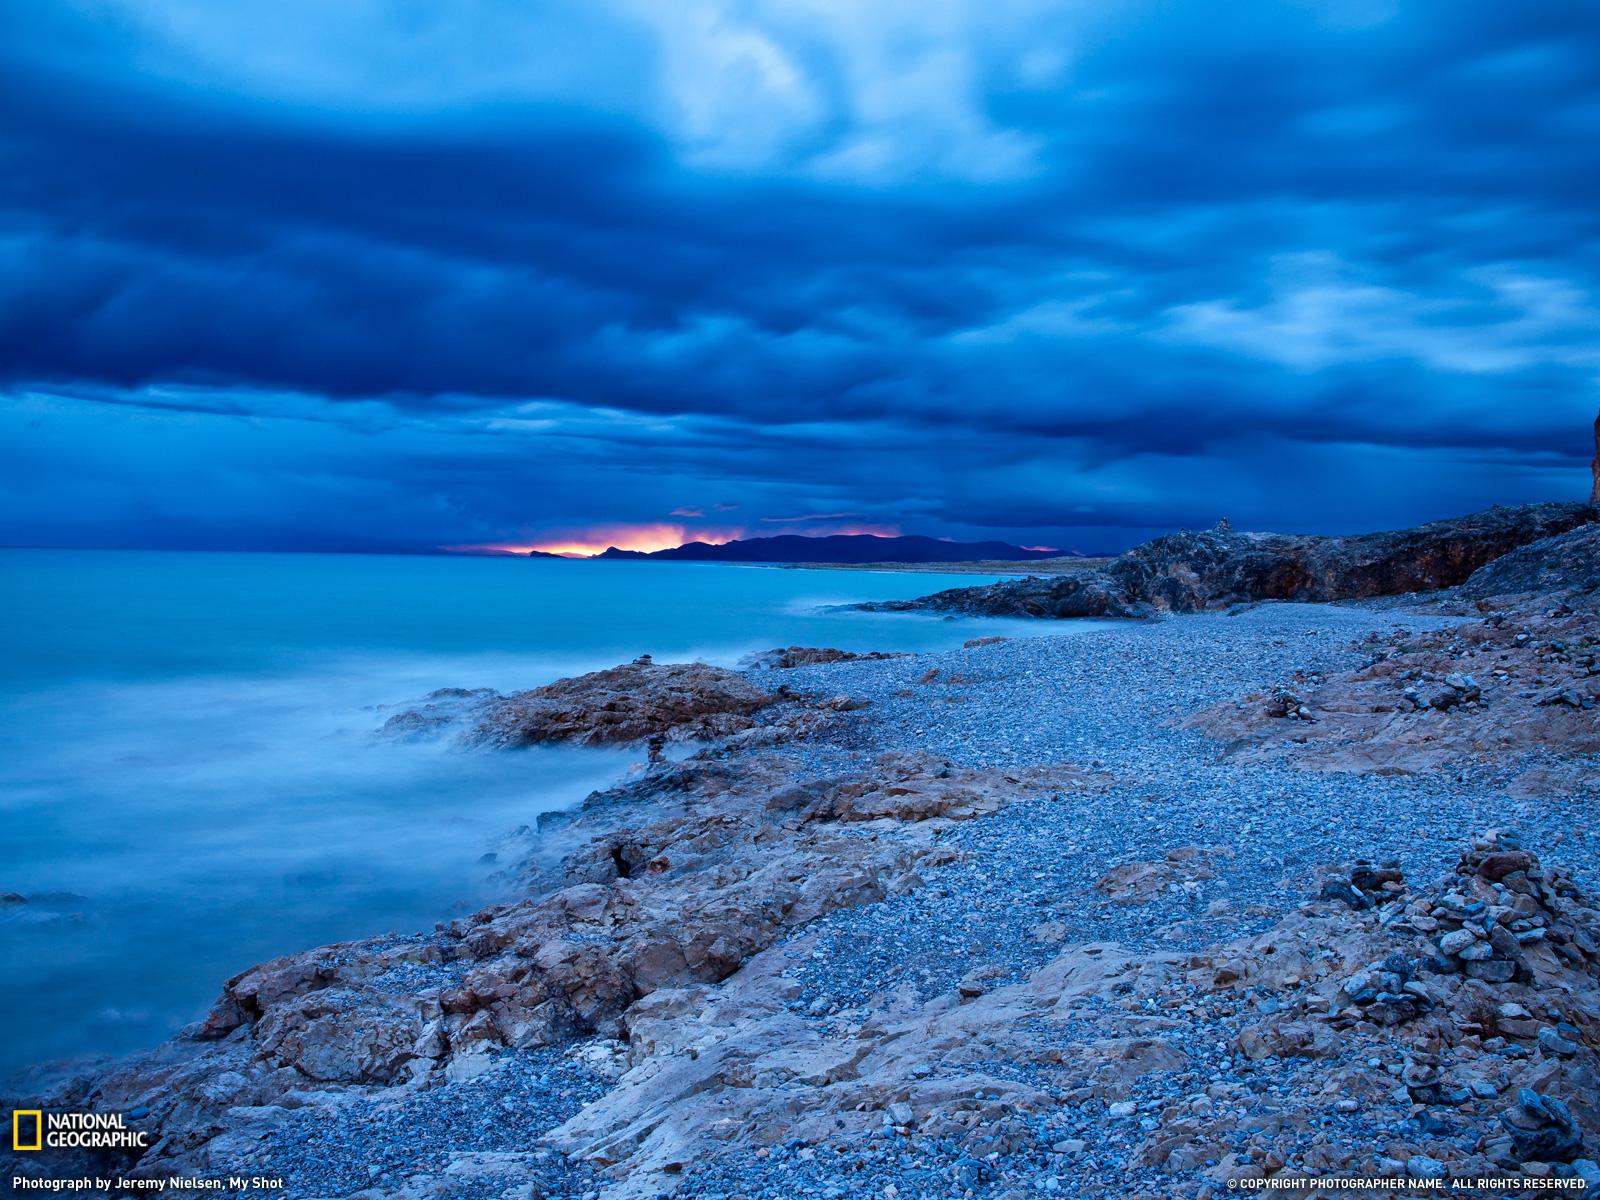 Namsto Lake Photo Tibet Wallpaper National Geographic 1600x1200